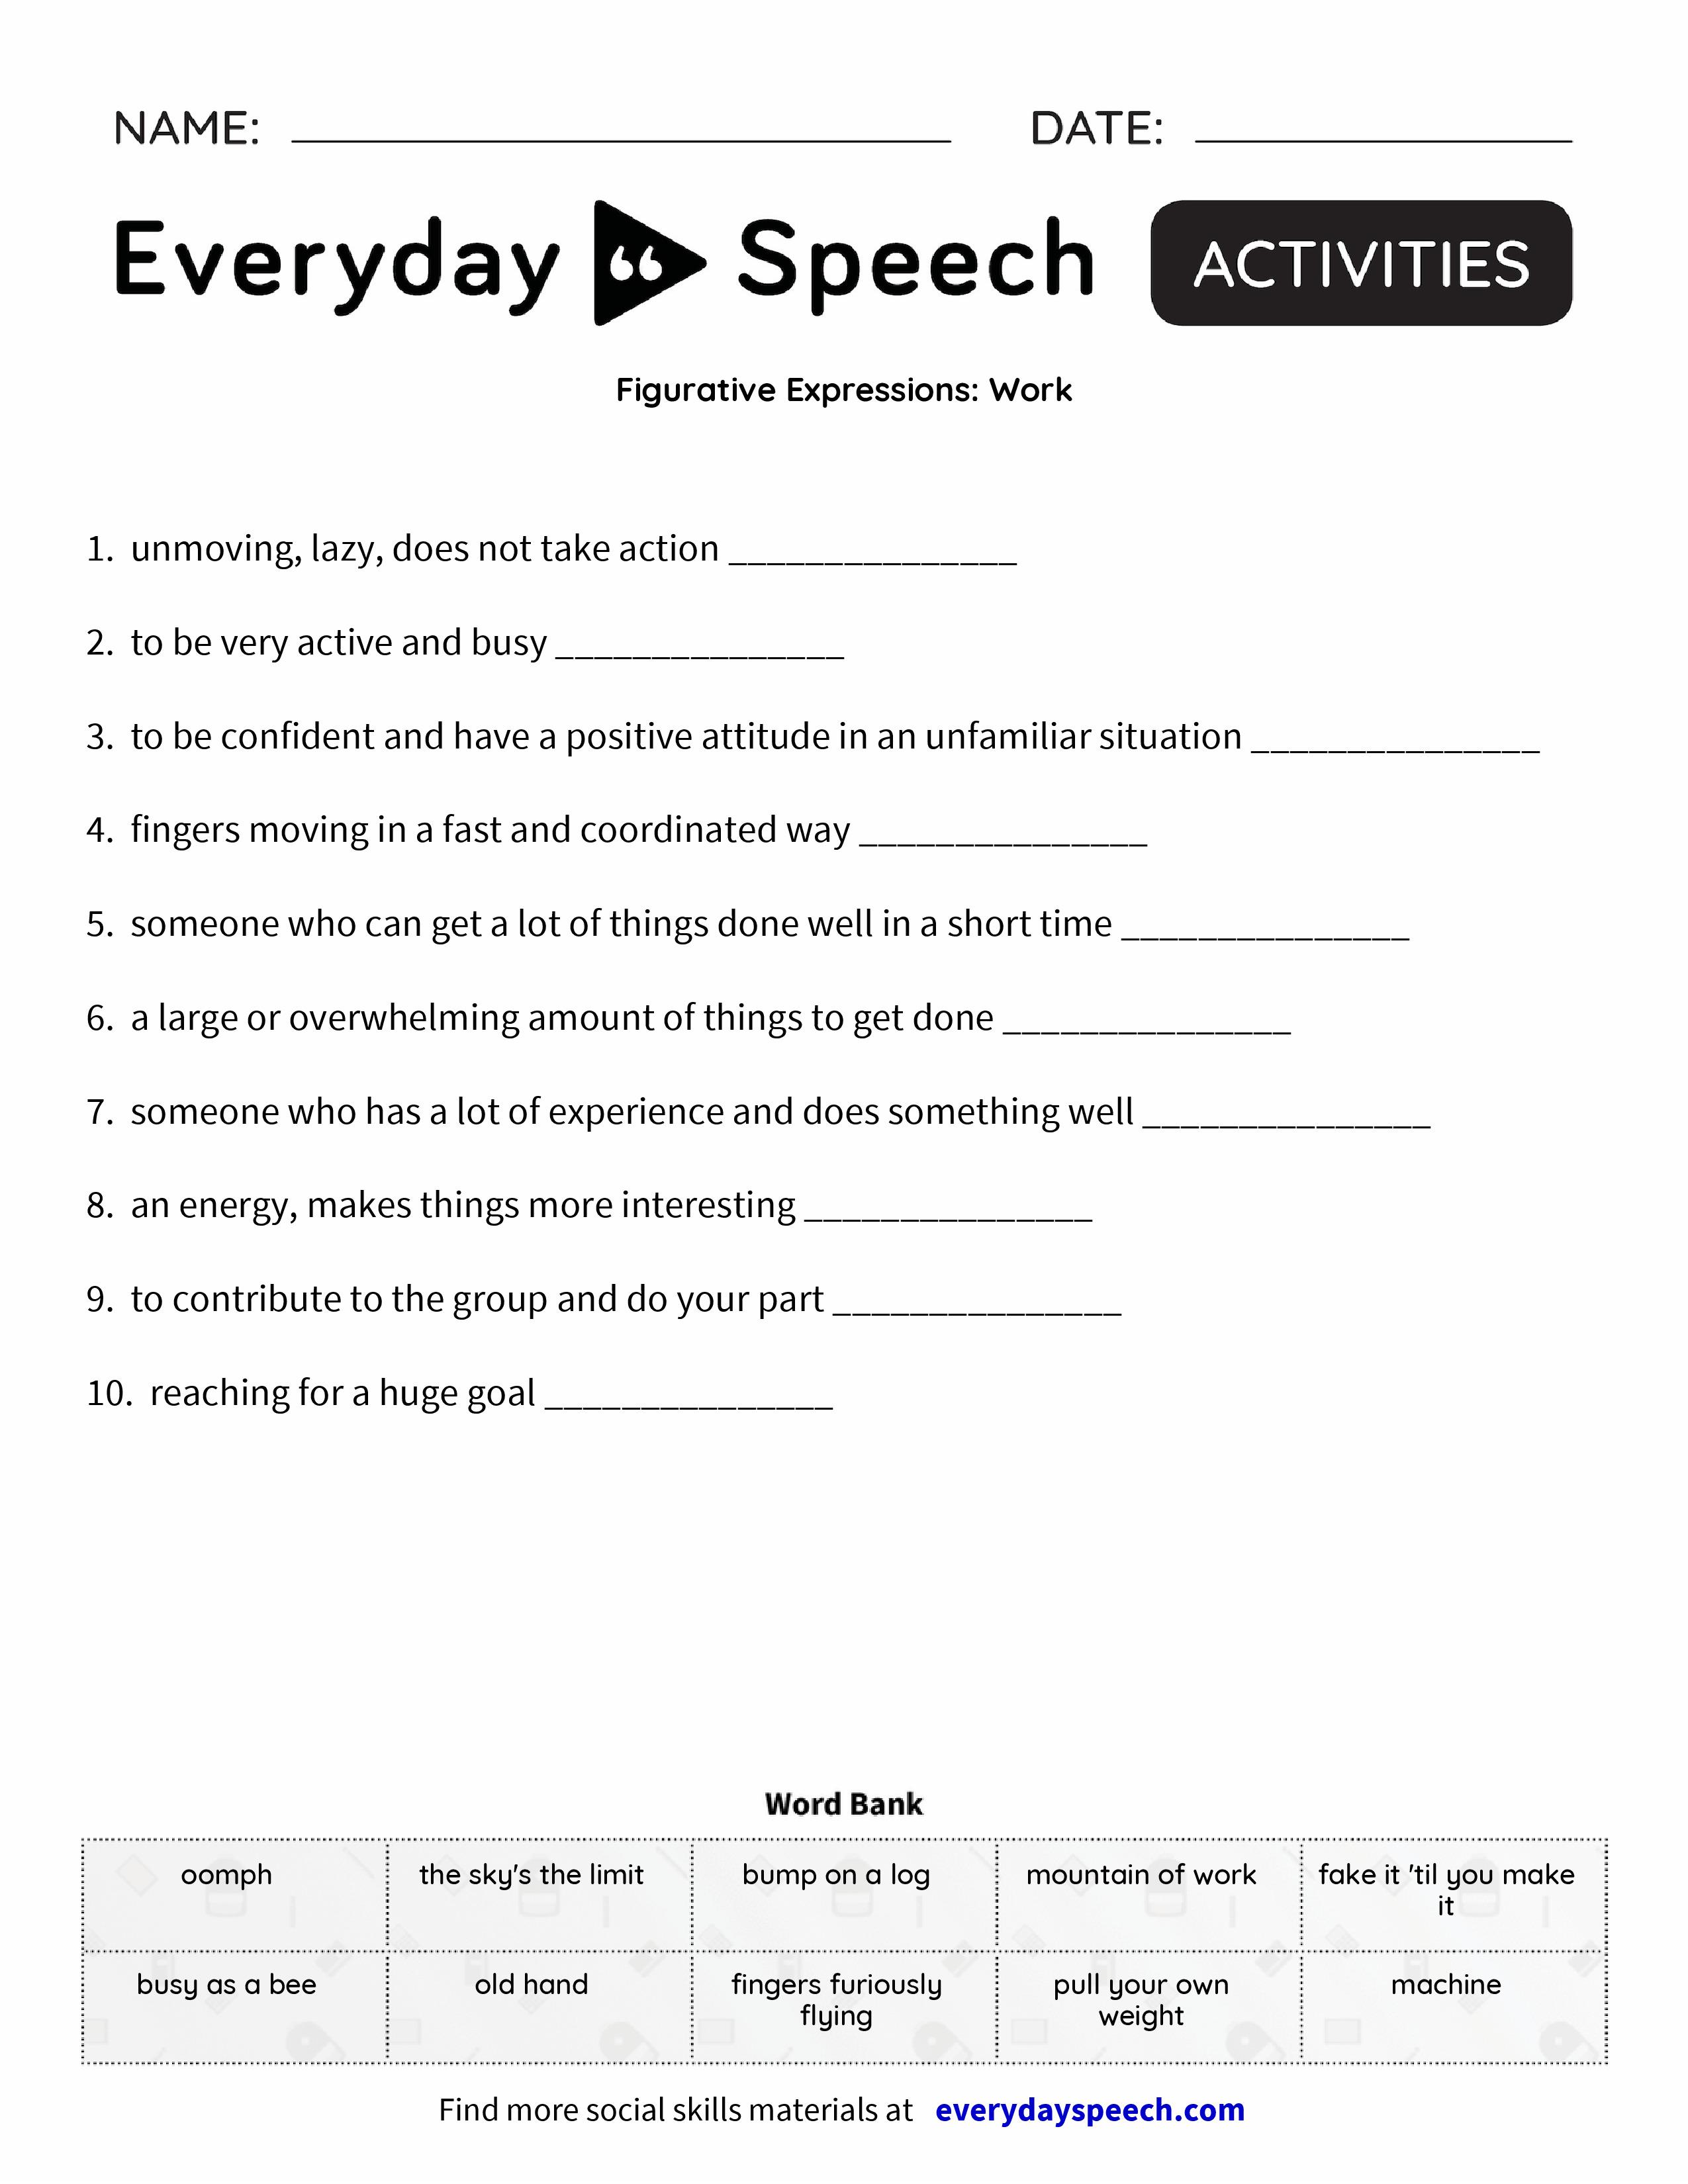 Figurative Expressions Work Everyday Speech Everyday Speech – Work Worksheets